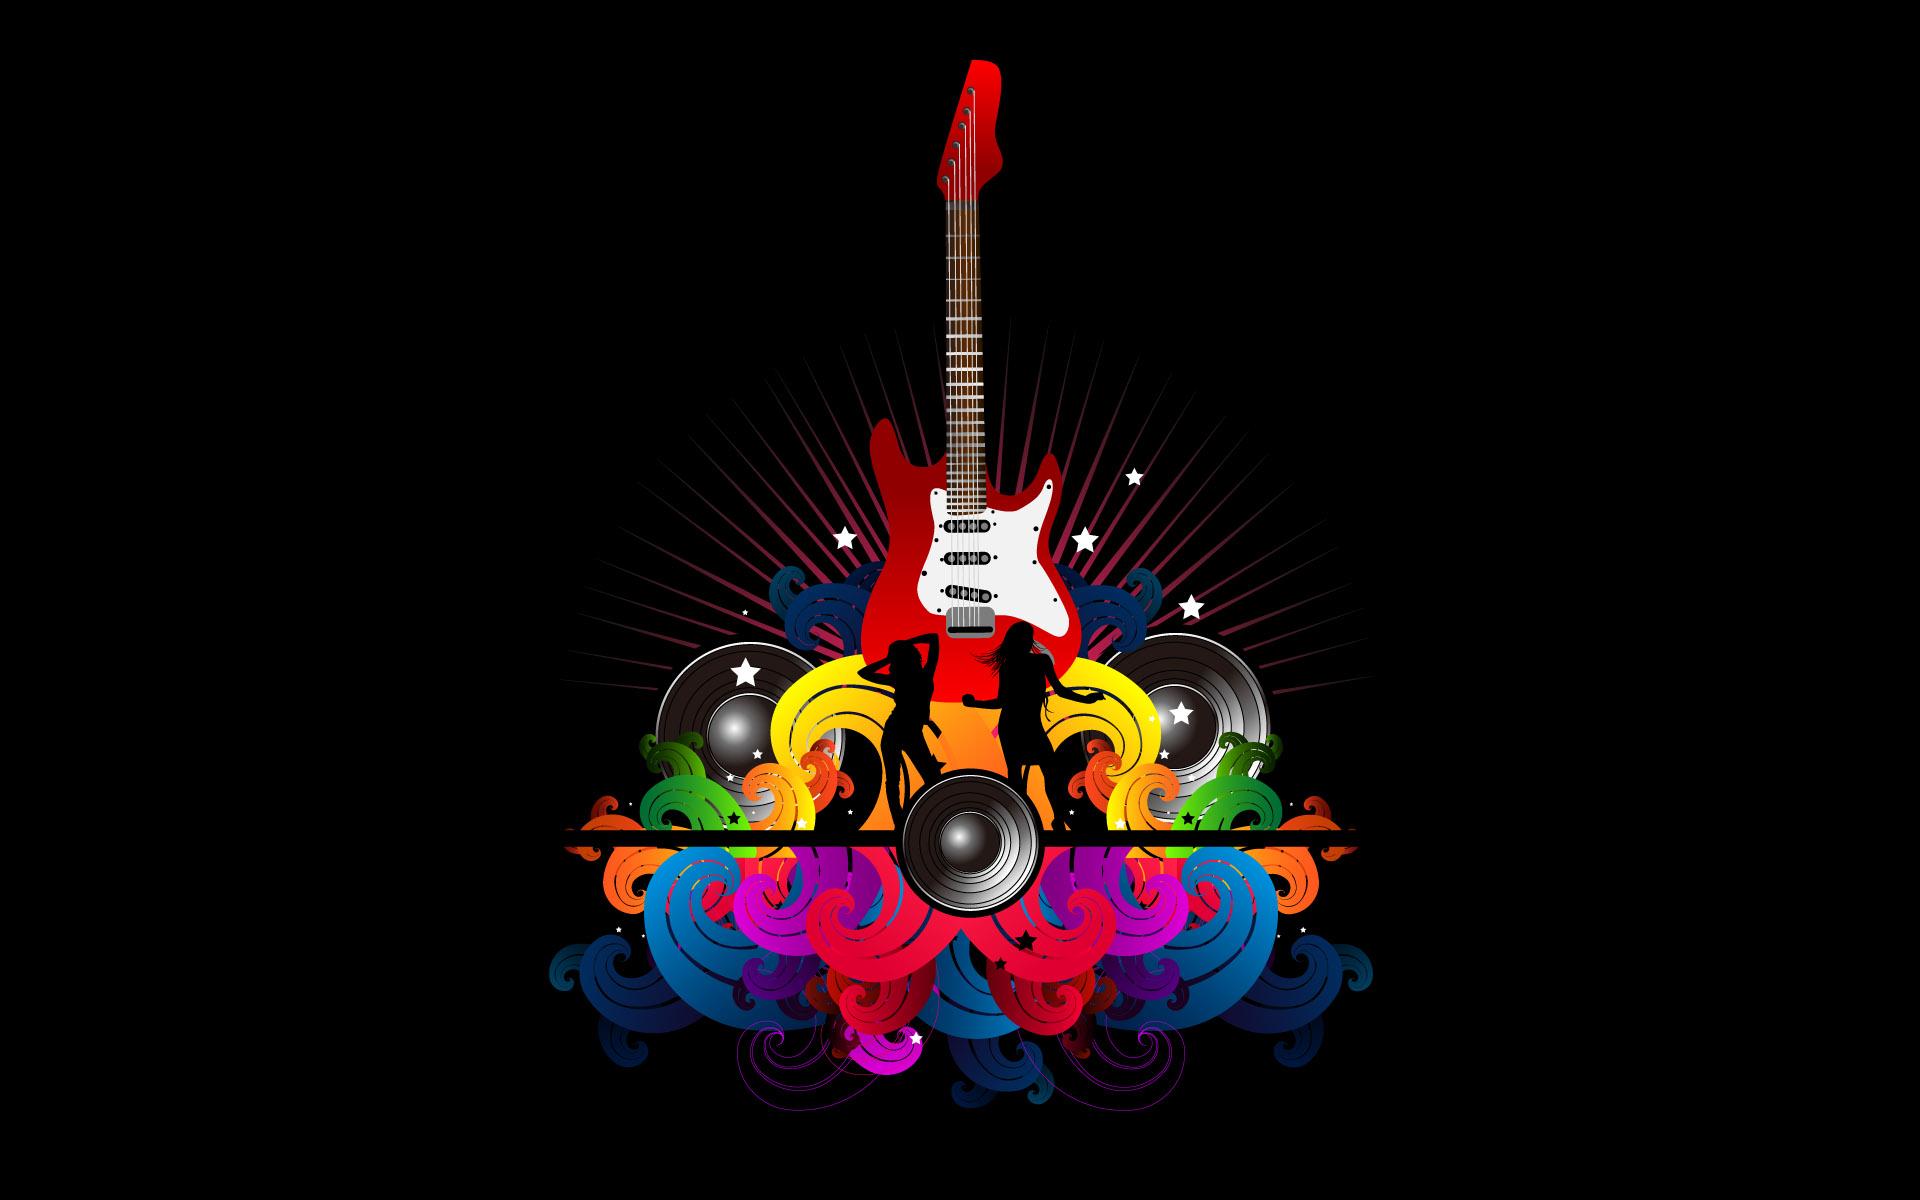 Abstract Guitar Wallpaper Desktop Background - Background Music Black Hd , HD Wallpaper & Backgrounds